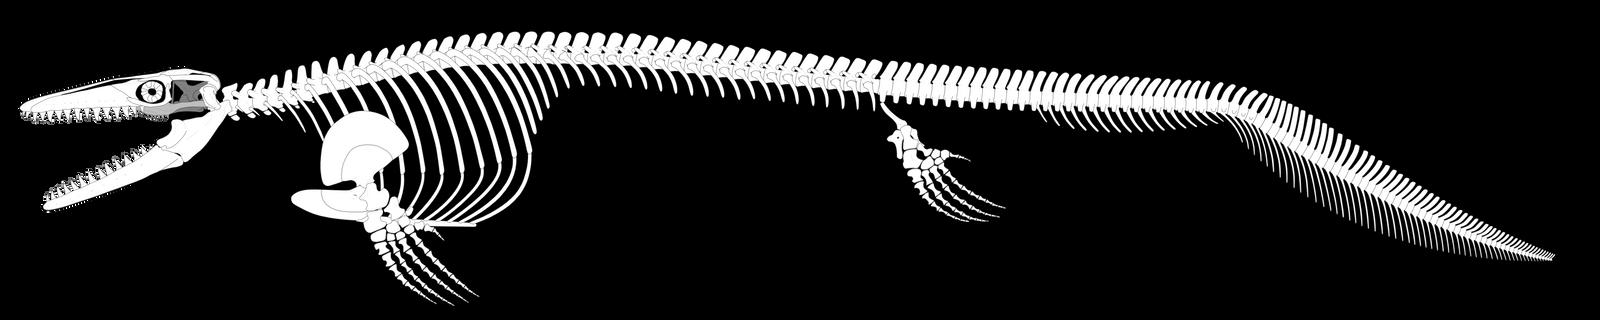 Mosasaurus hoffmannii Reconstruction (UPDATED) by PWNZ3R-Dragon